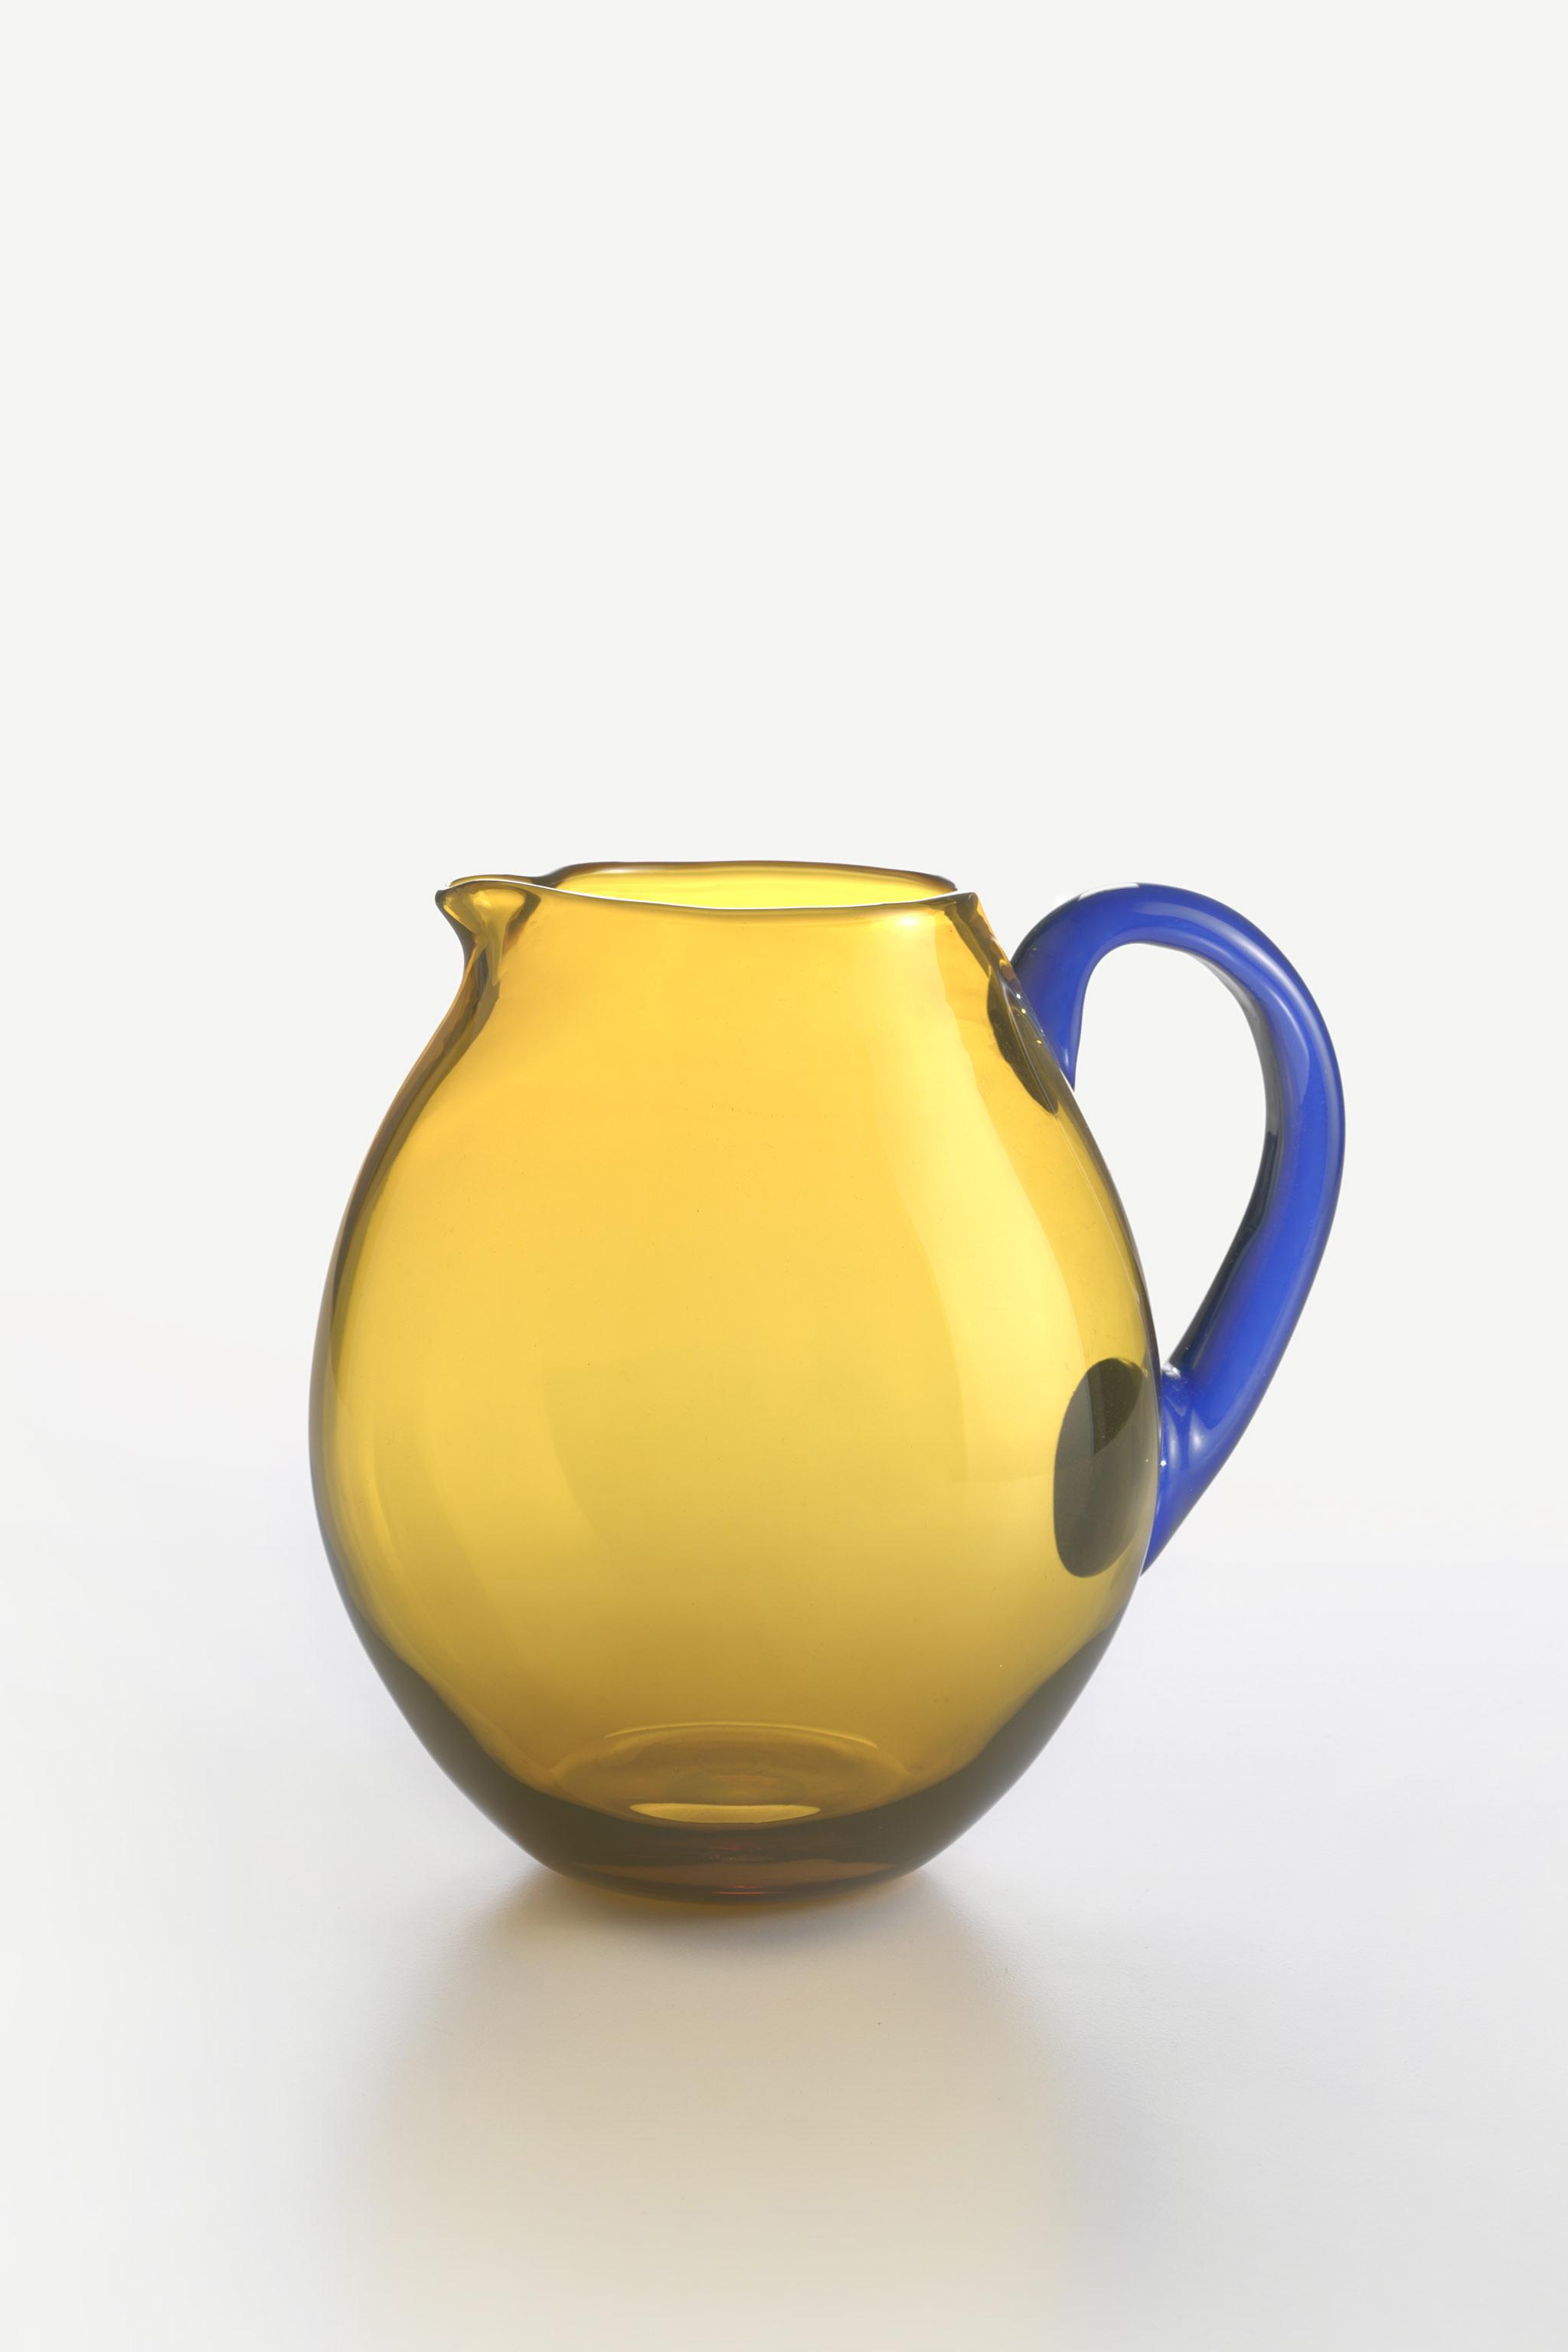 Caraffa Dandy Blu Giallo